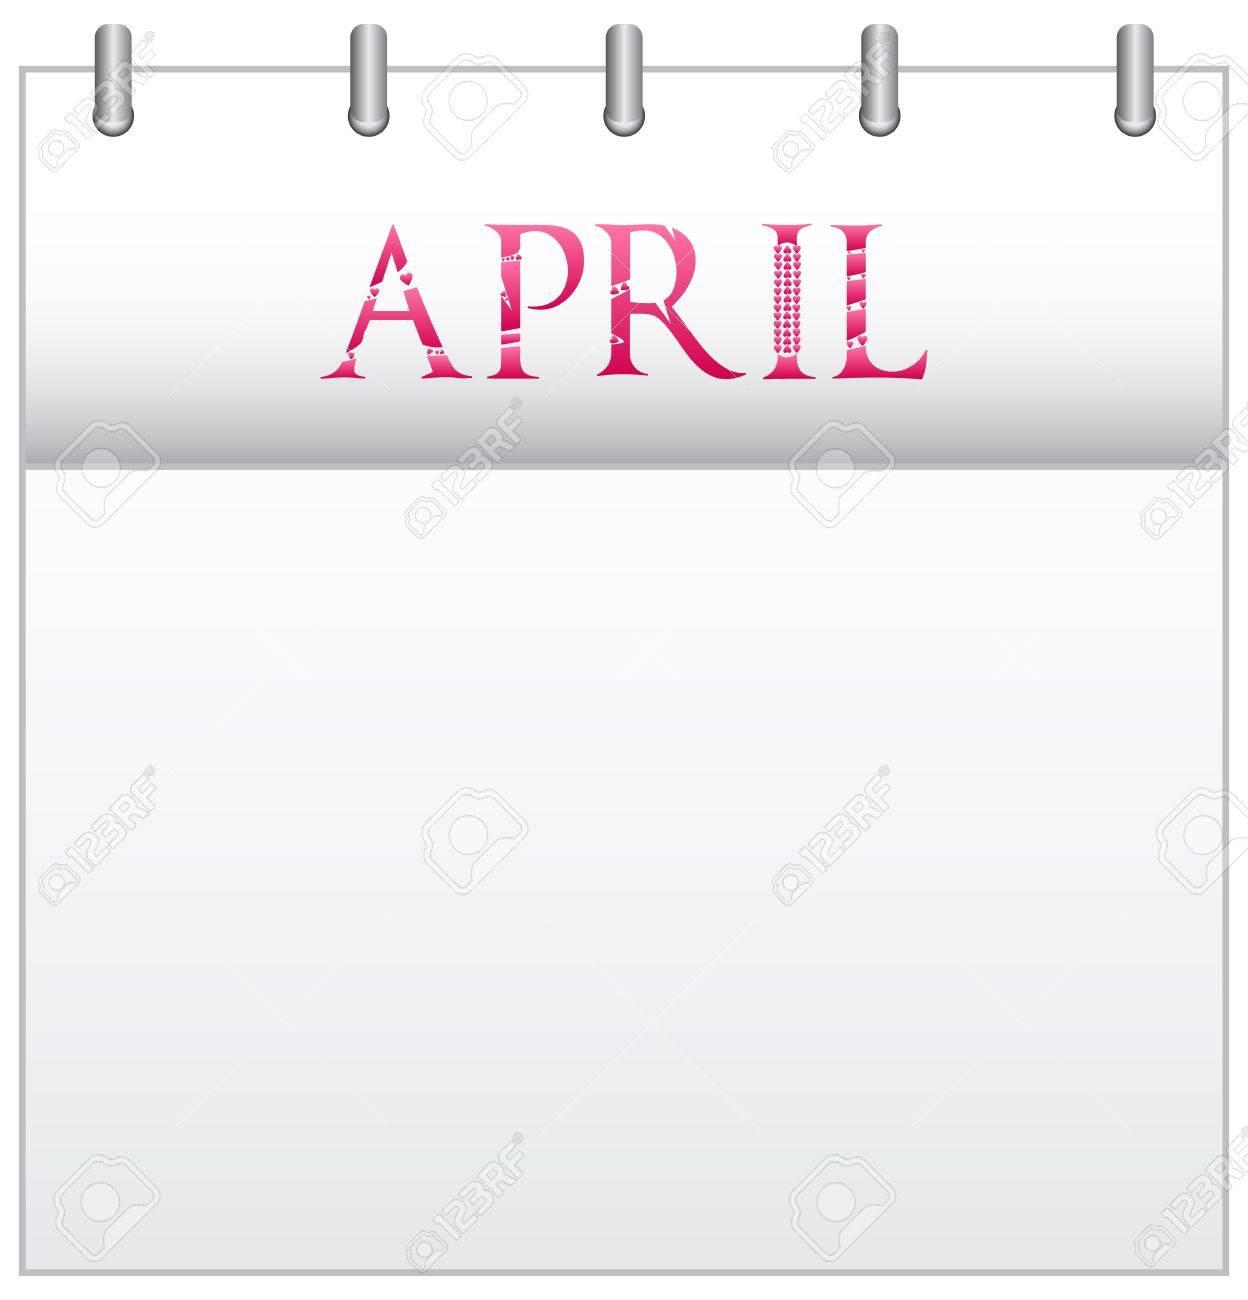 Calendar Month April With Custom Love Font Stock Vector - 19049679